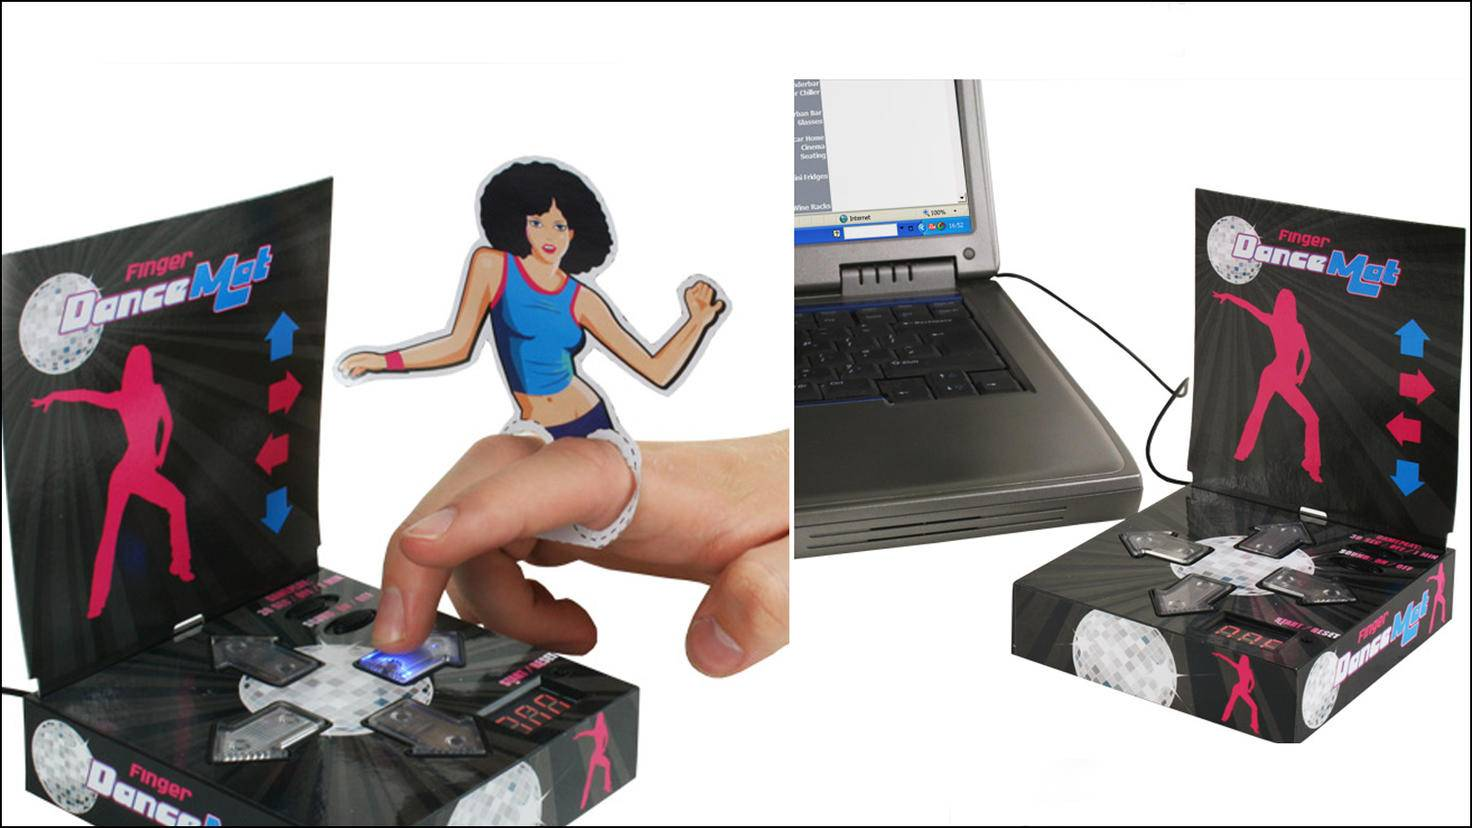 USB Finger Dancemat